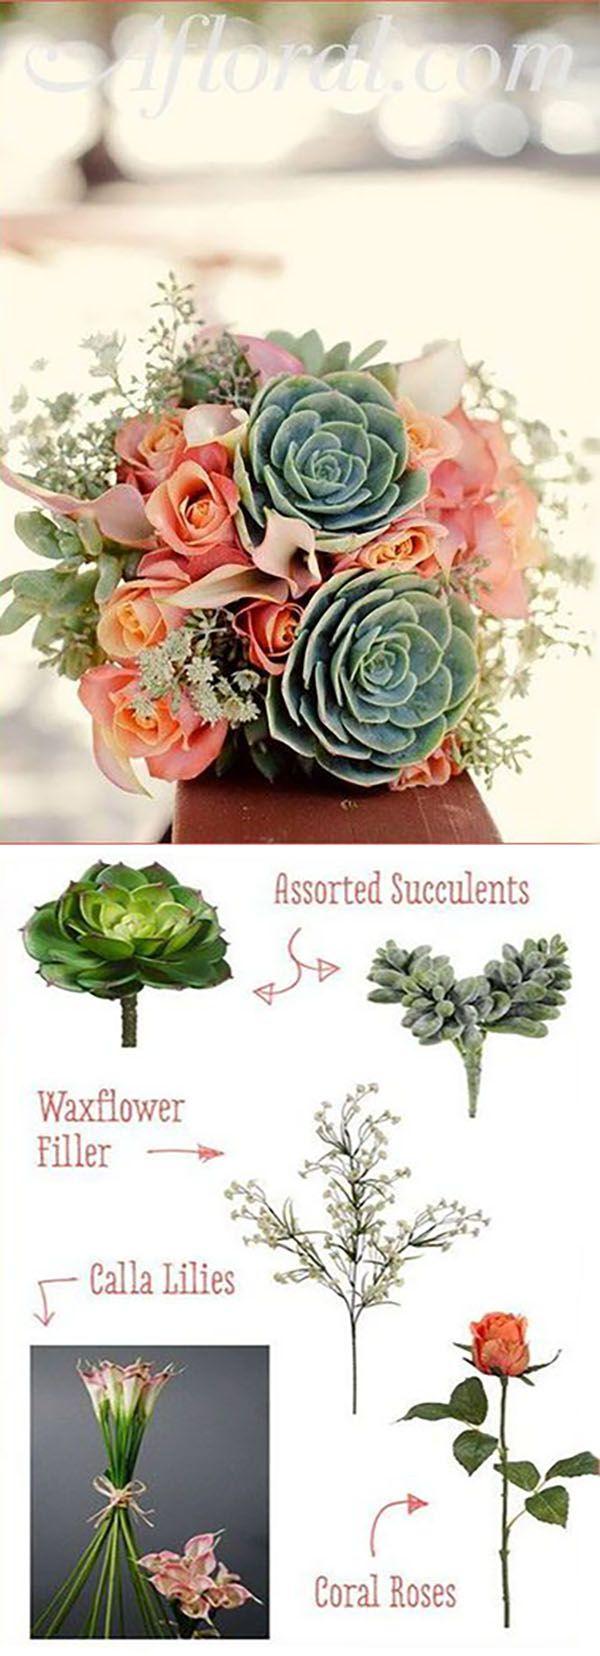 169 best The wedding bouquet images on Pinterest | Bridal bouquets ...